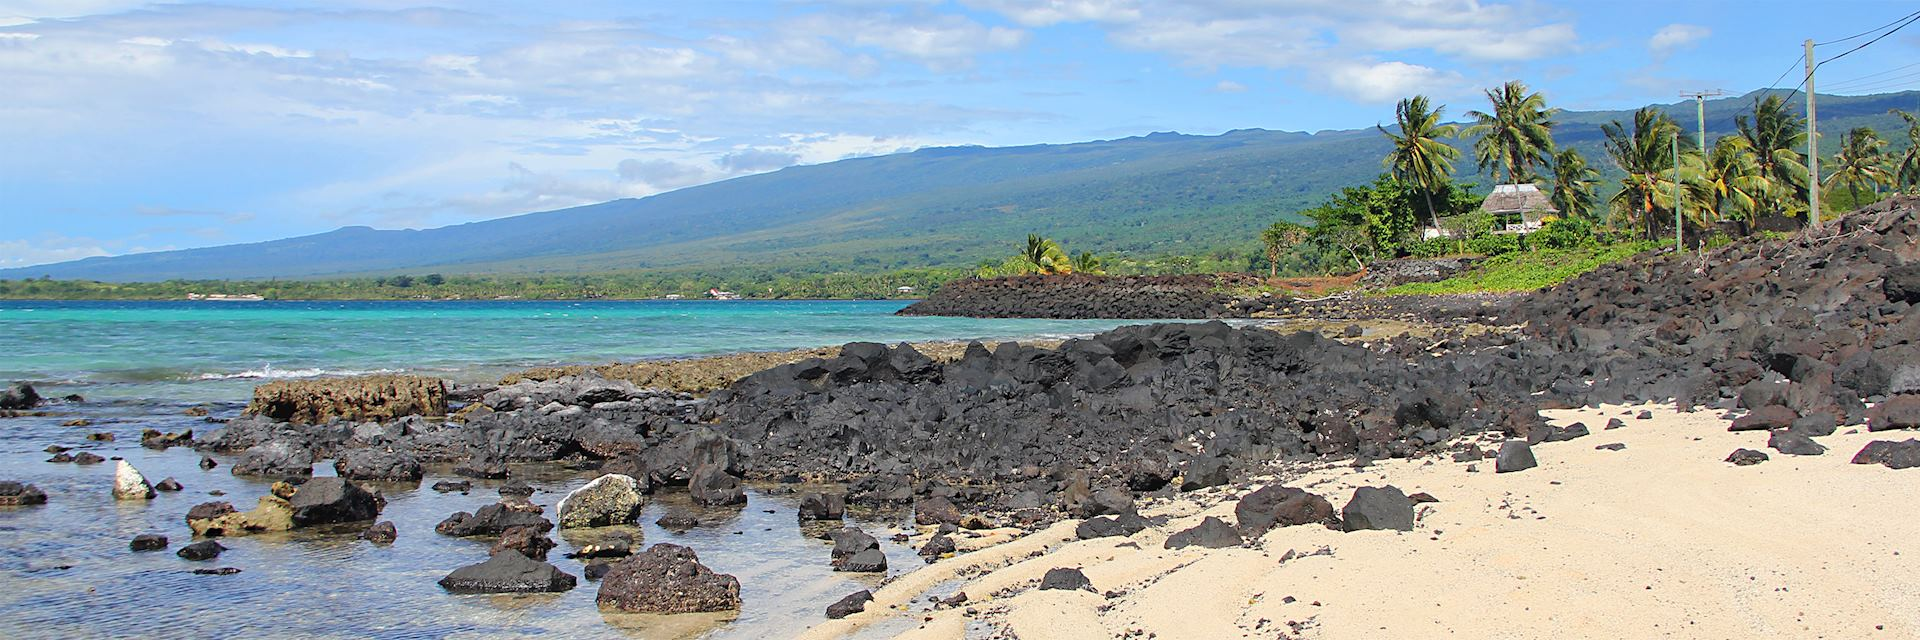 Beach on Savai'i, Samoa